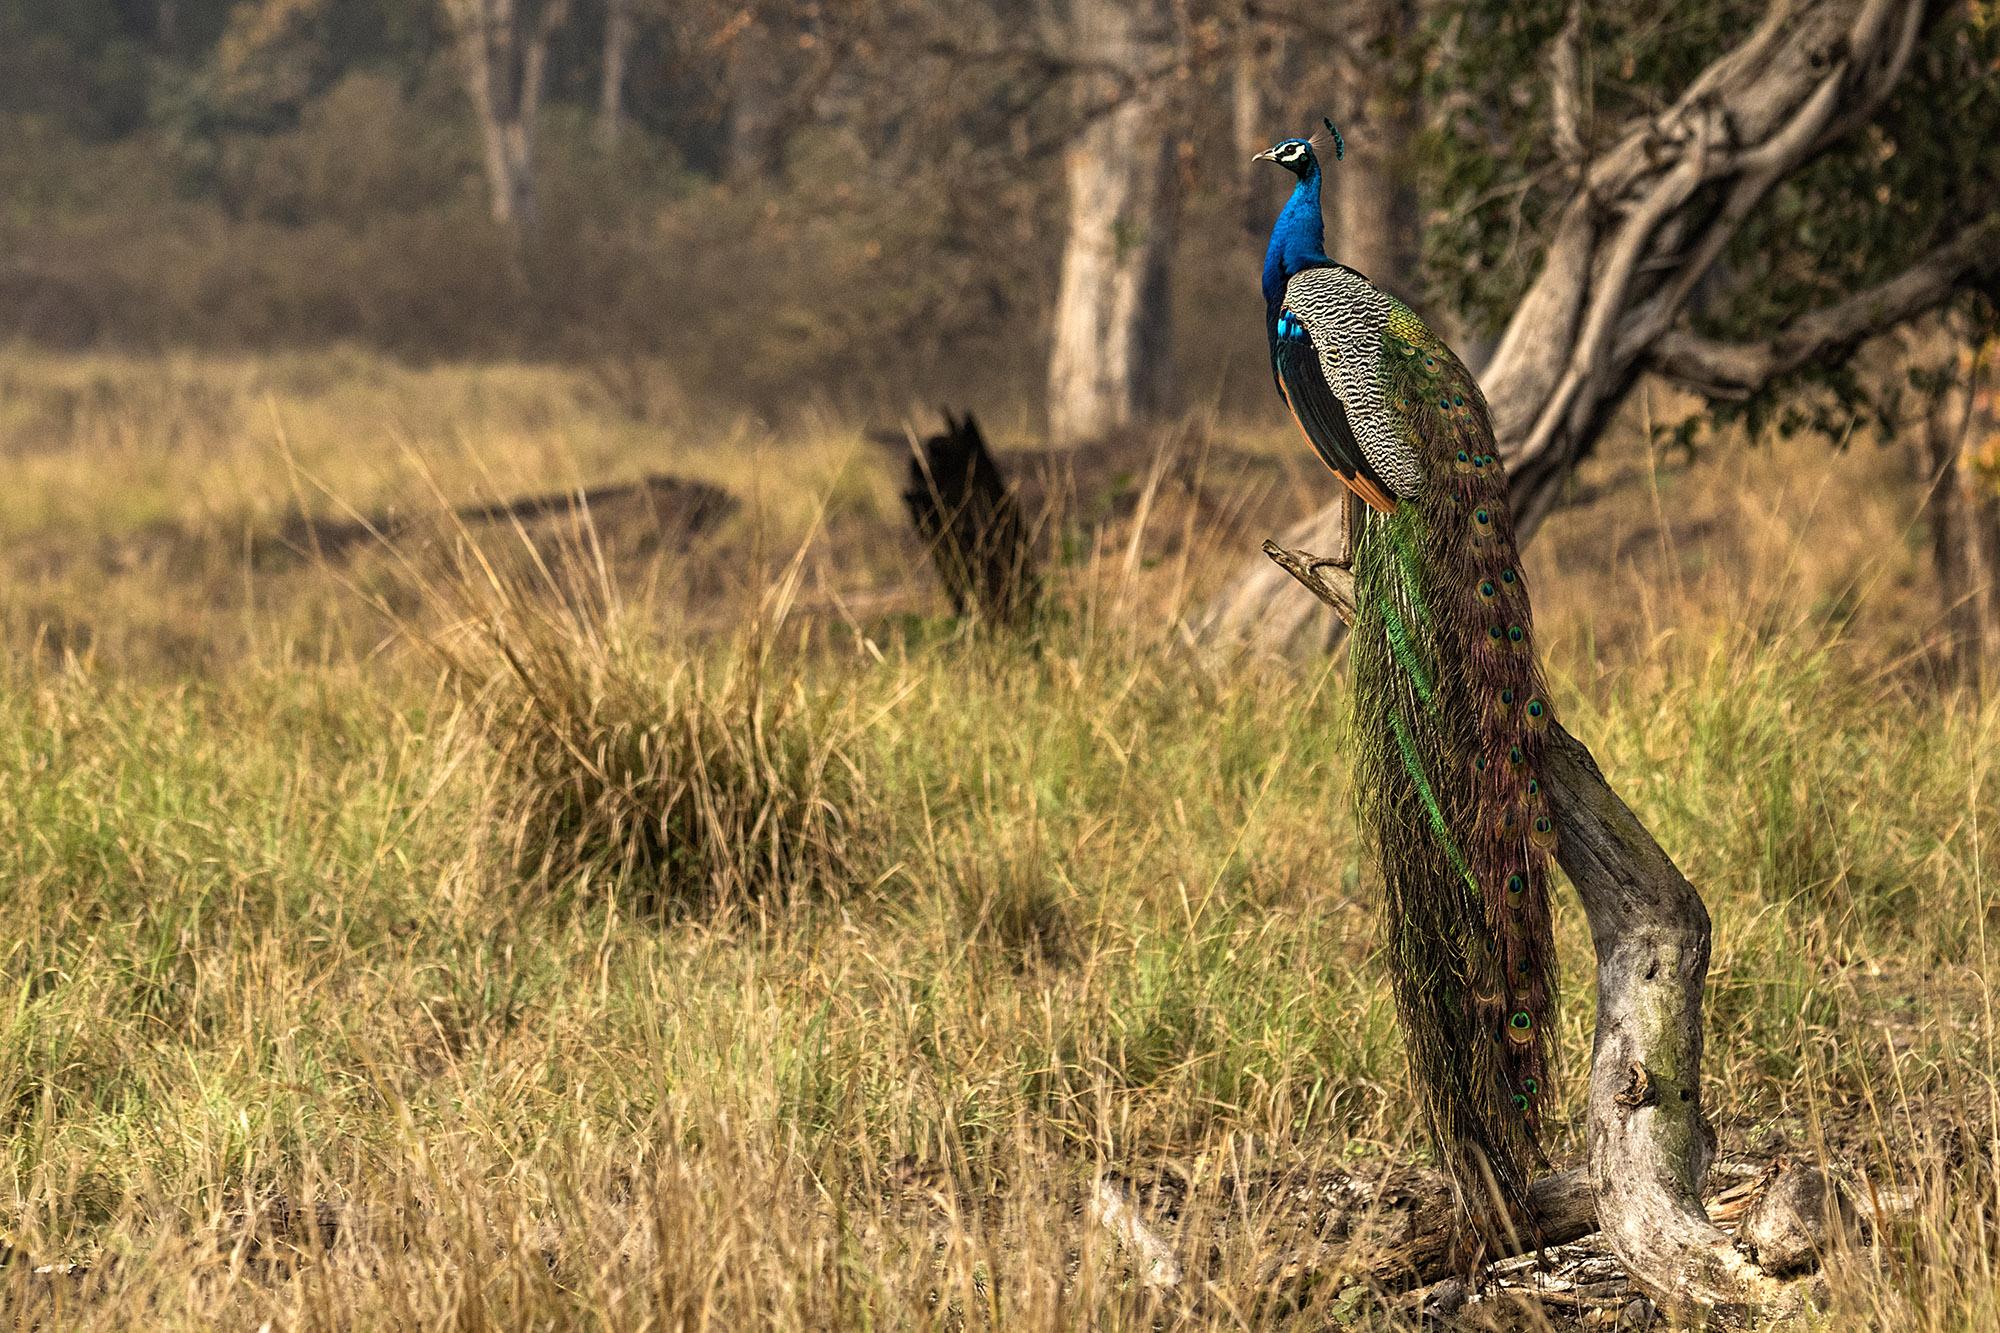 Peacock @dkinwild